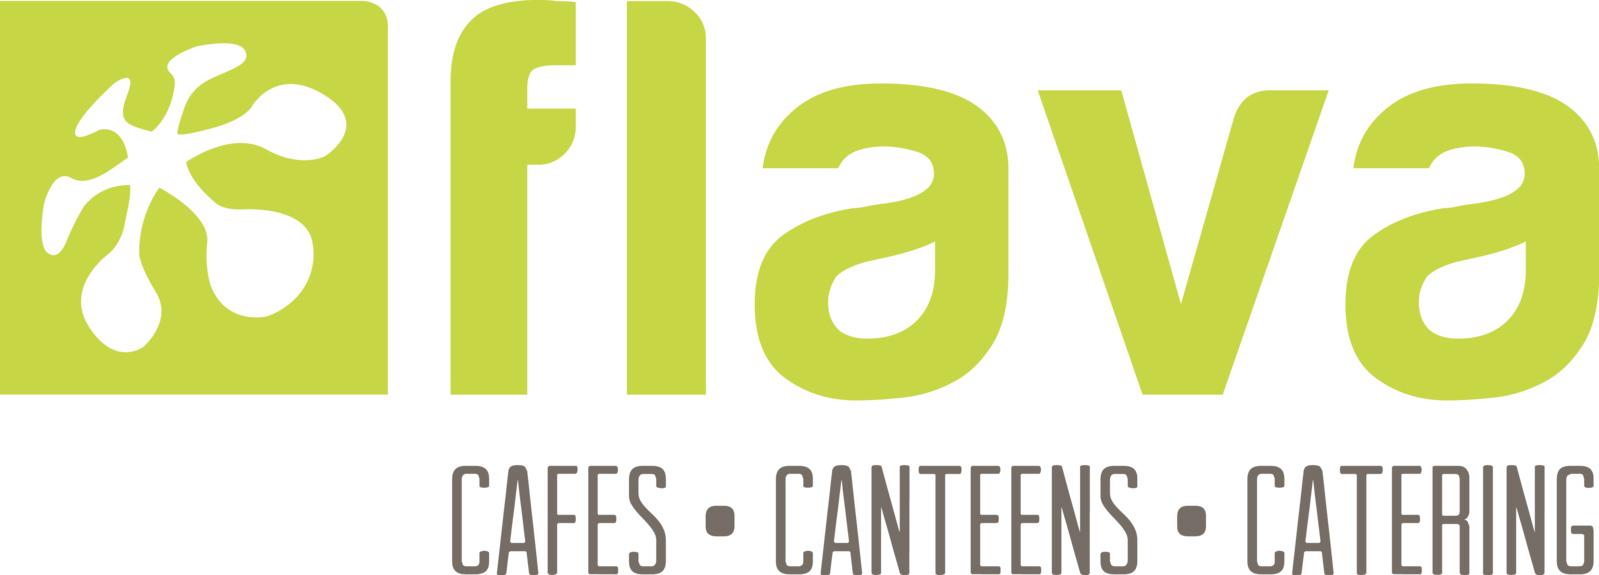 Cafe Flava